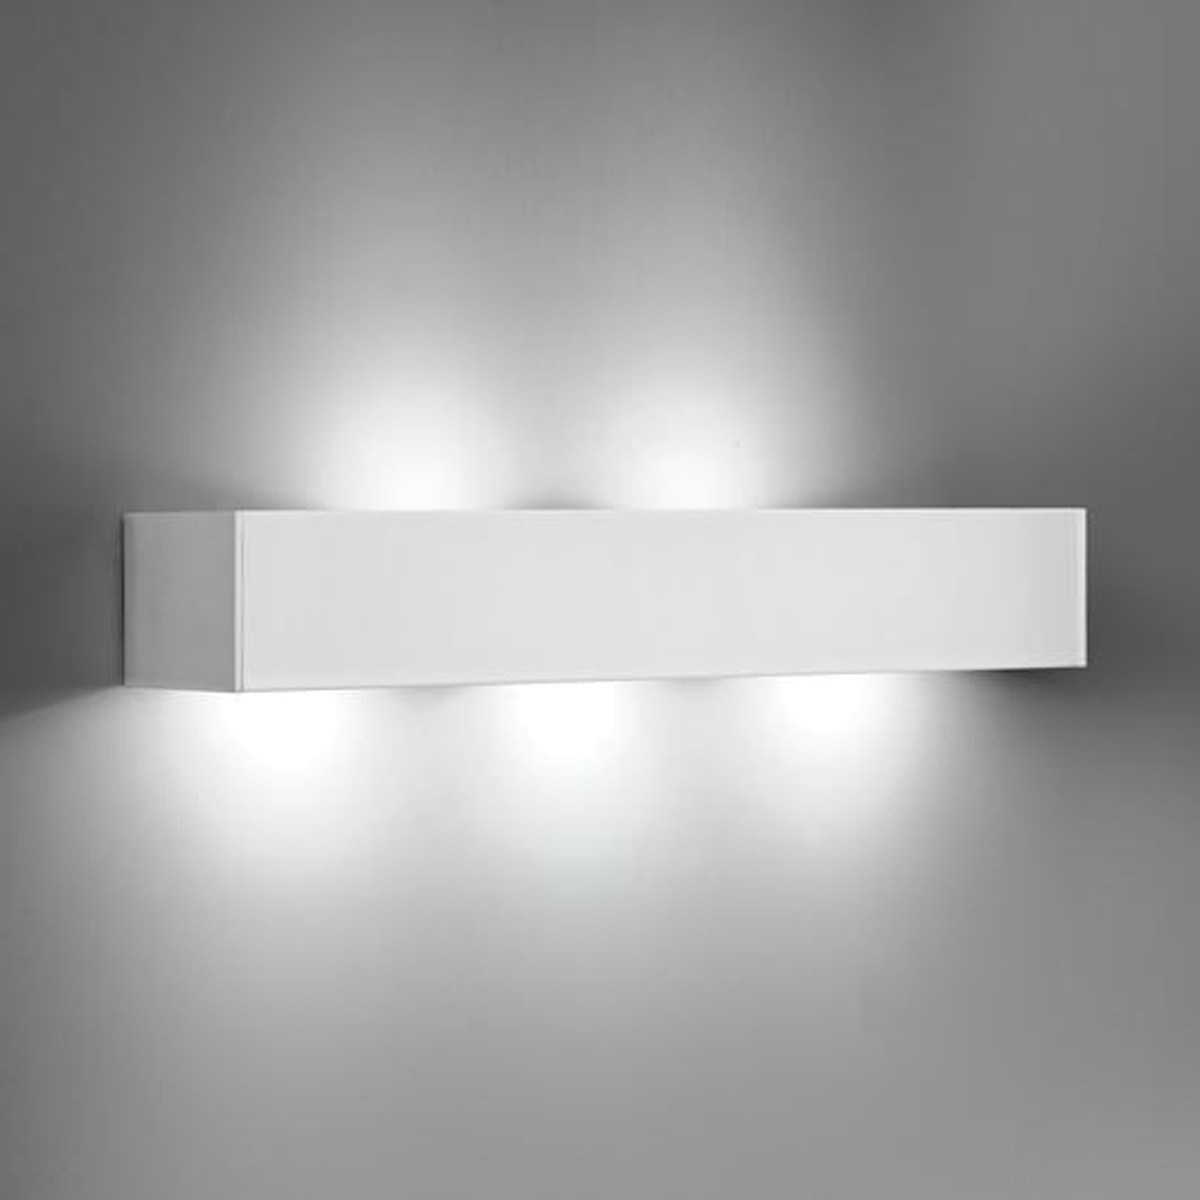 Milan T-LED Wandleuchte, 5-flg., weiß lackiert